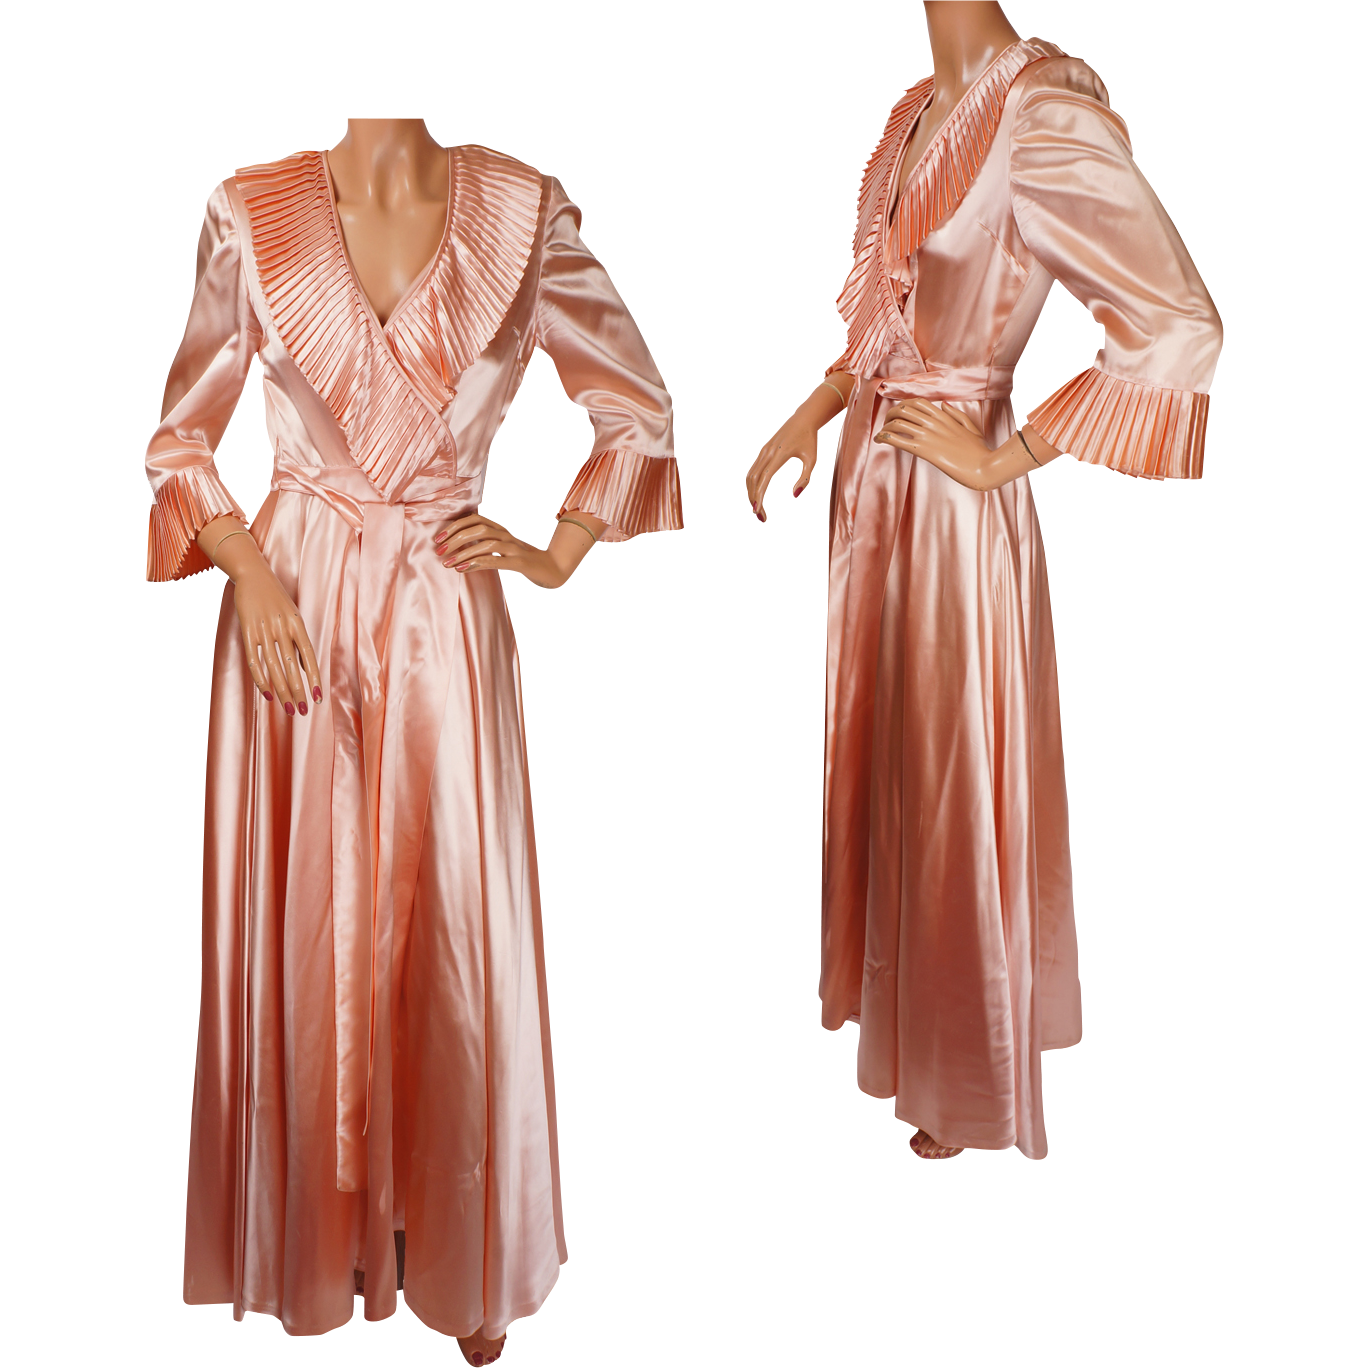 Antique Dressing Gown: Vintage Peignoir 1940s Pink Satin Dressing Gown